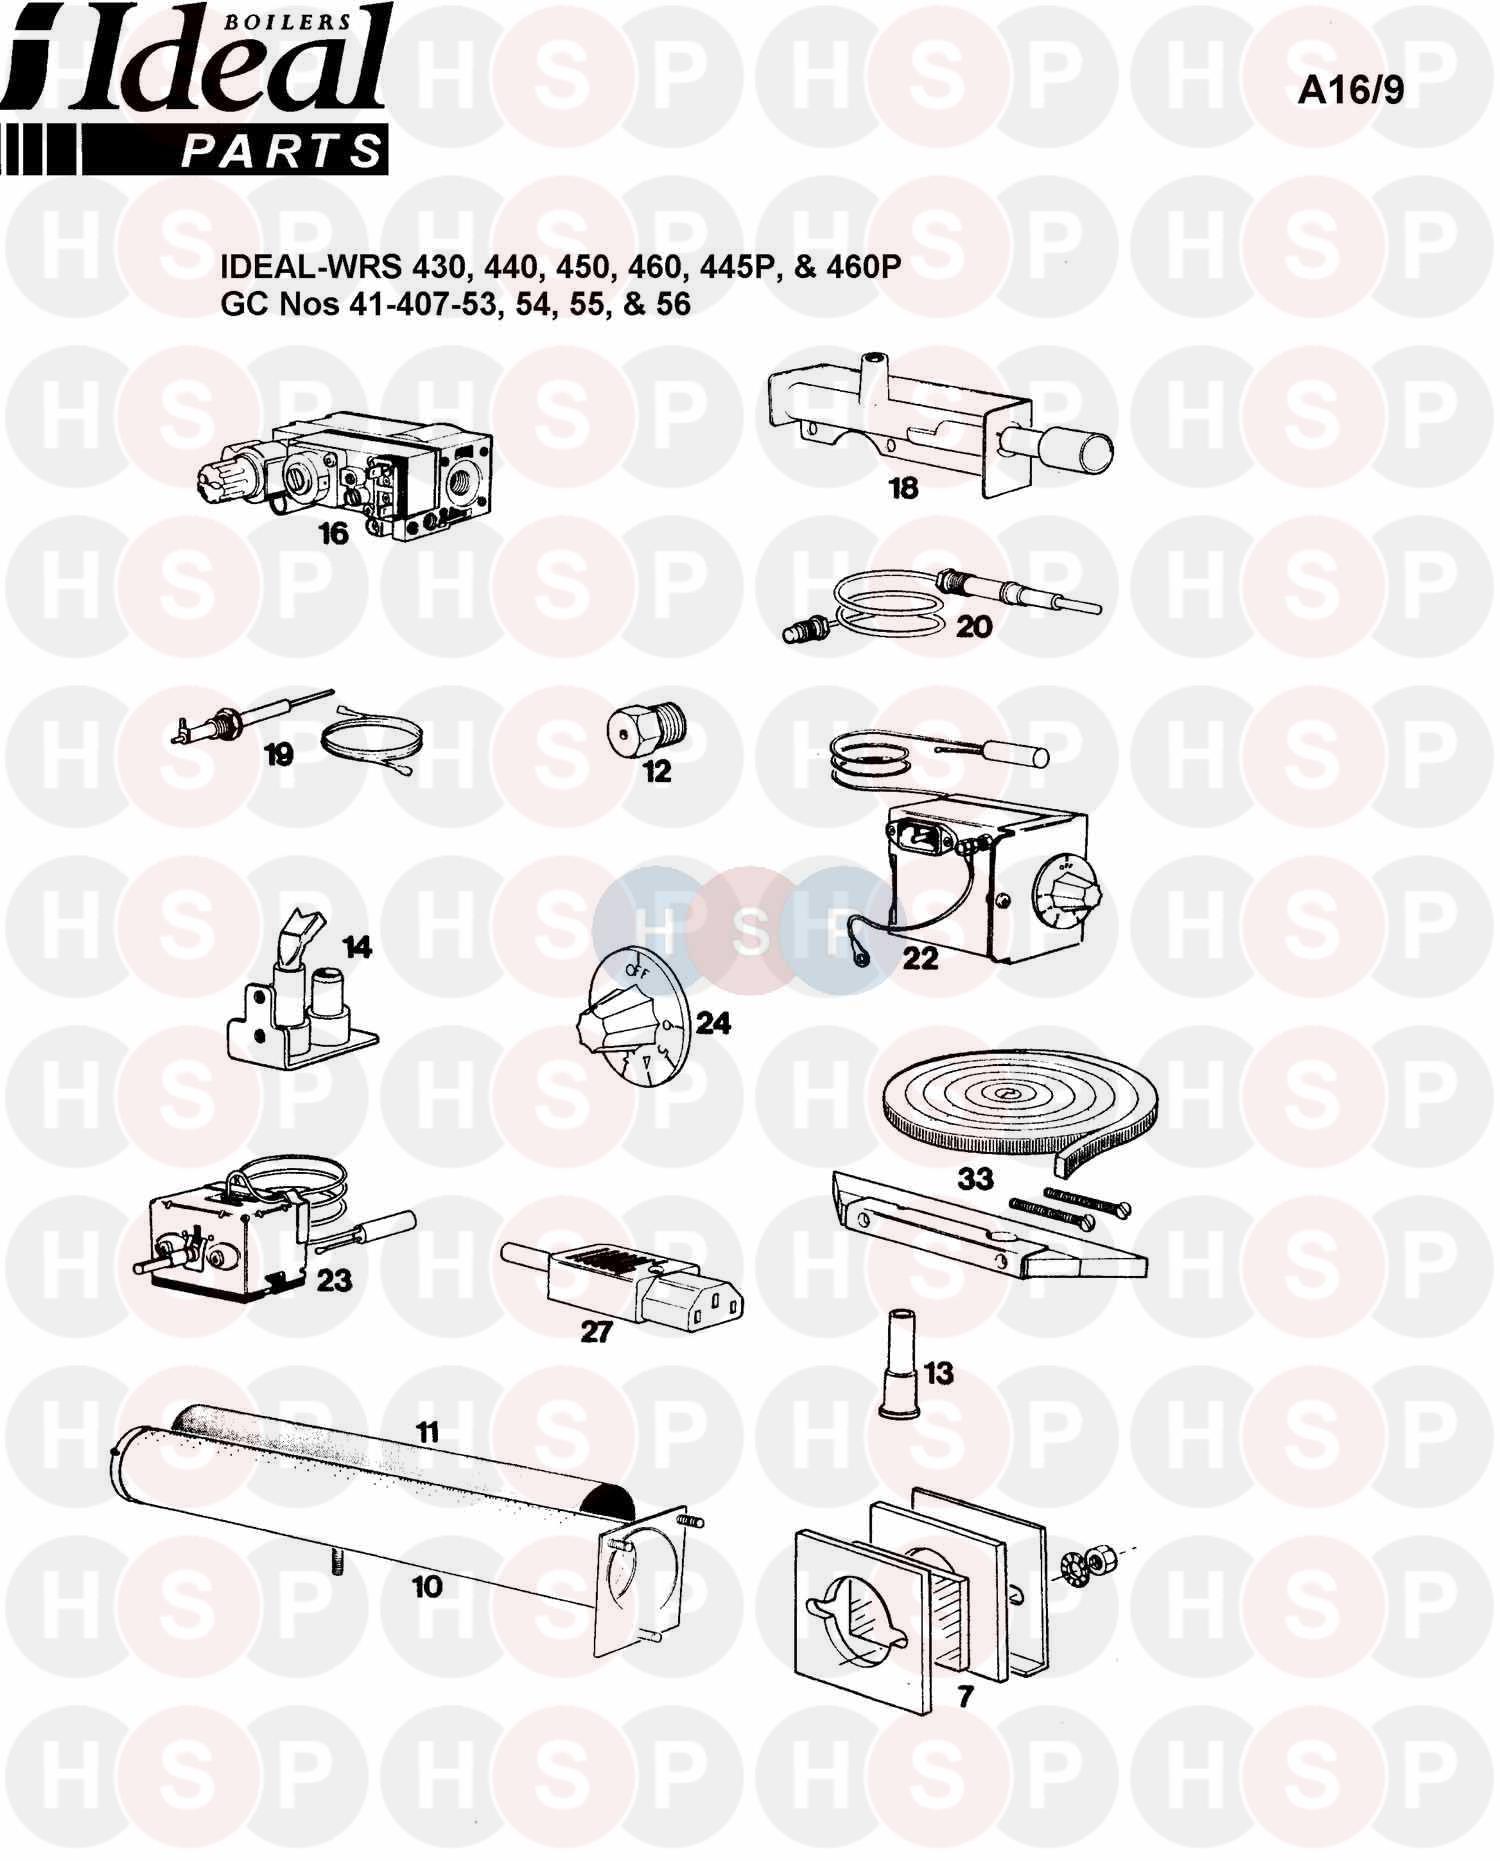 ideal concord wrs 460 programmer diagram heating spare. Black Bedroom Furniture Sets. Home Design Ideas